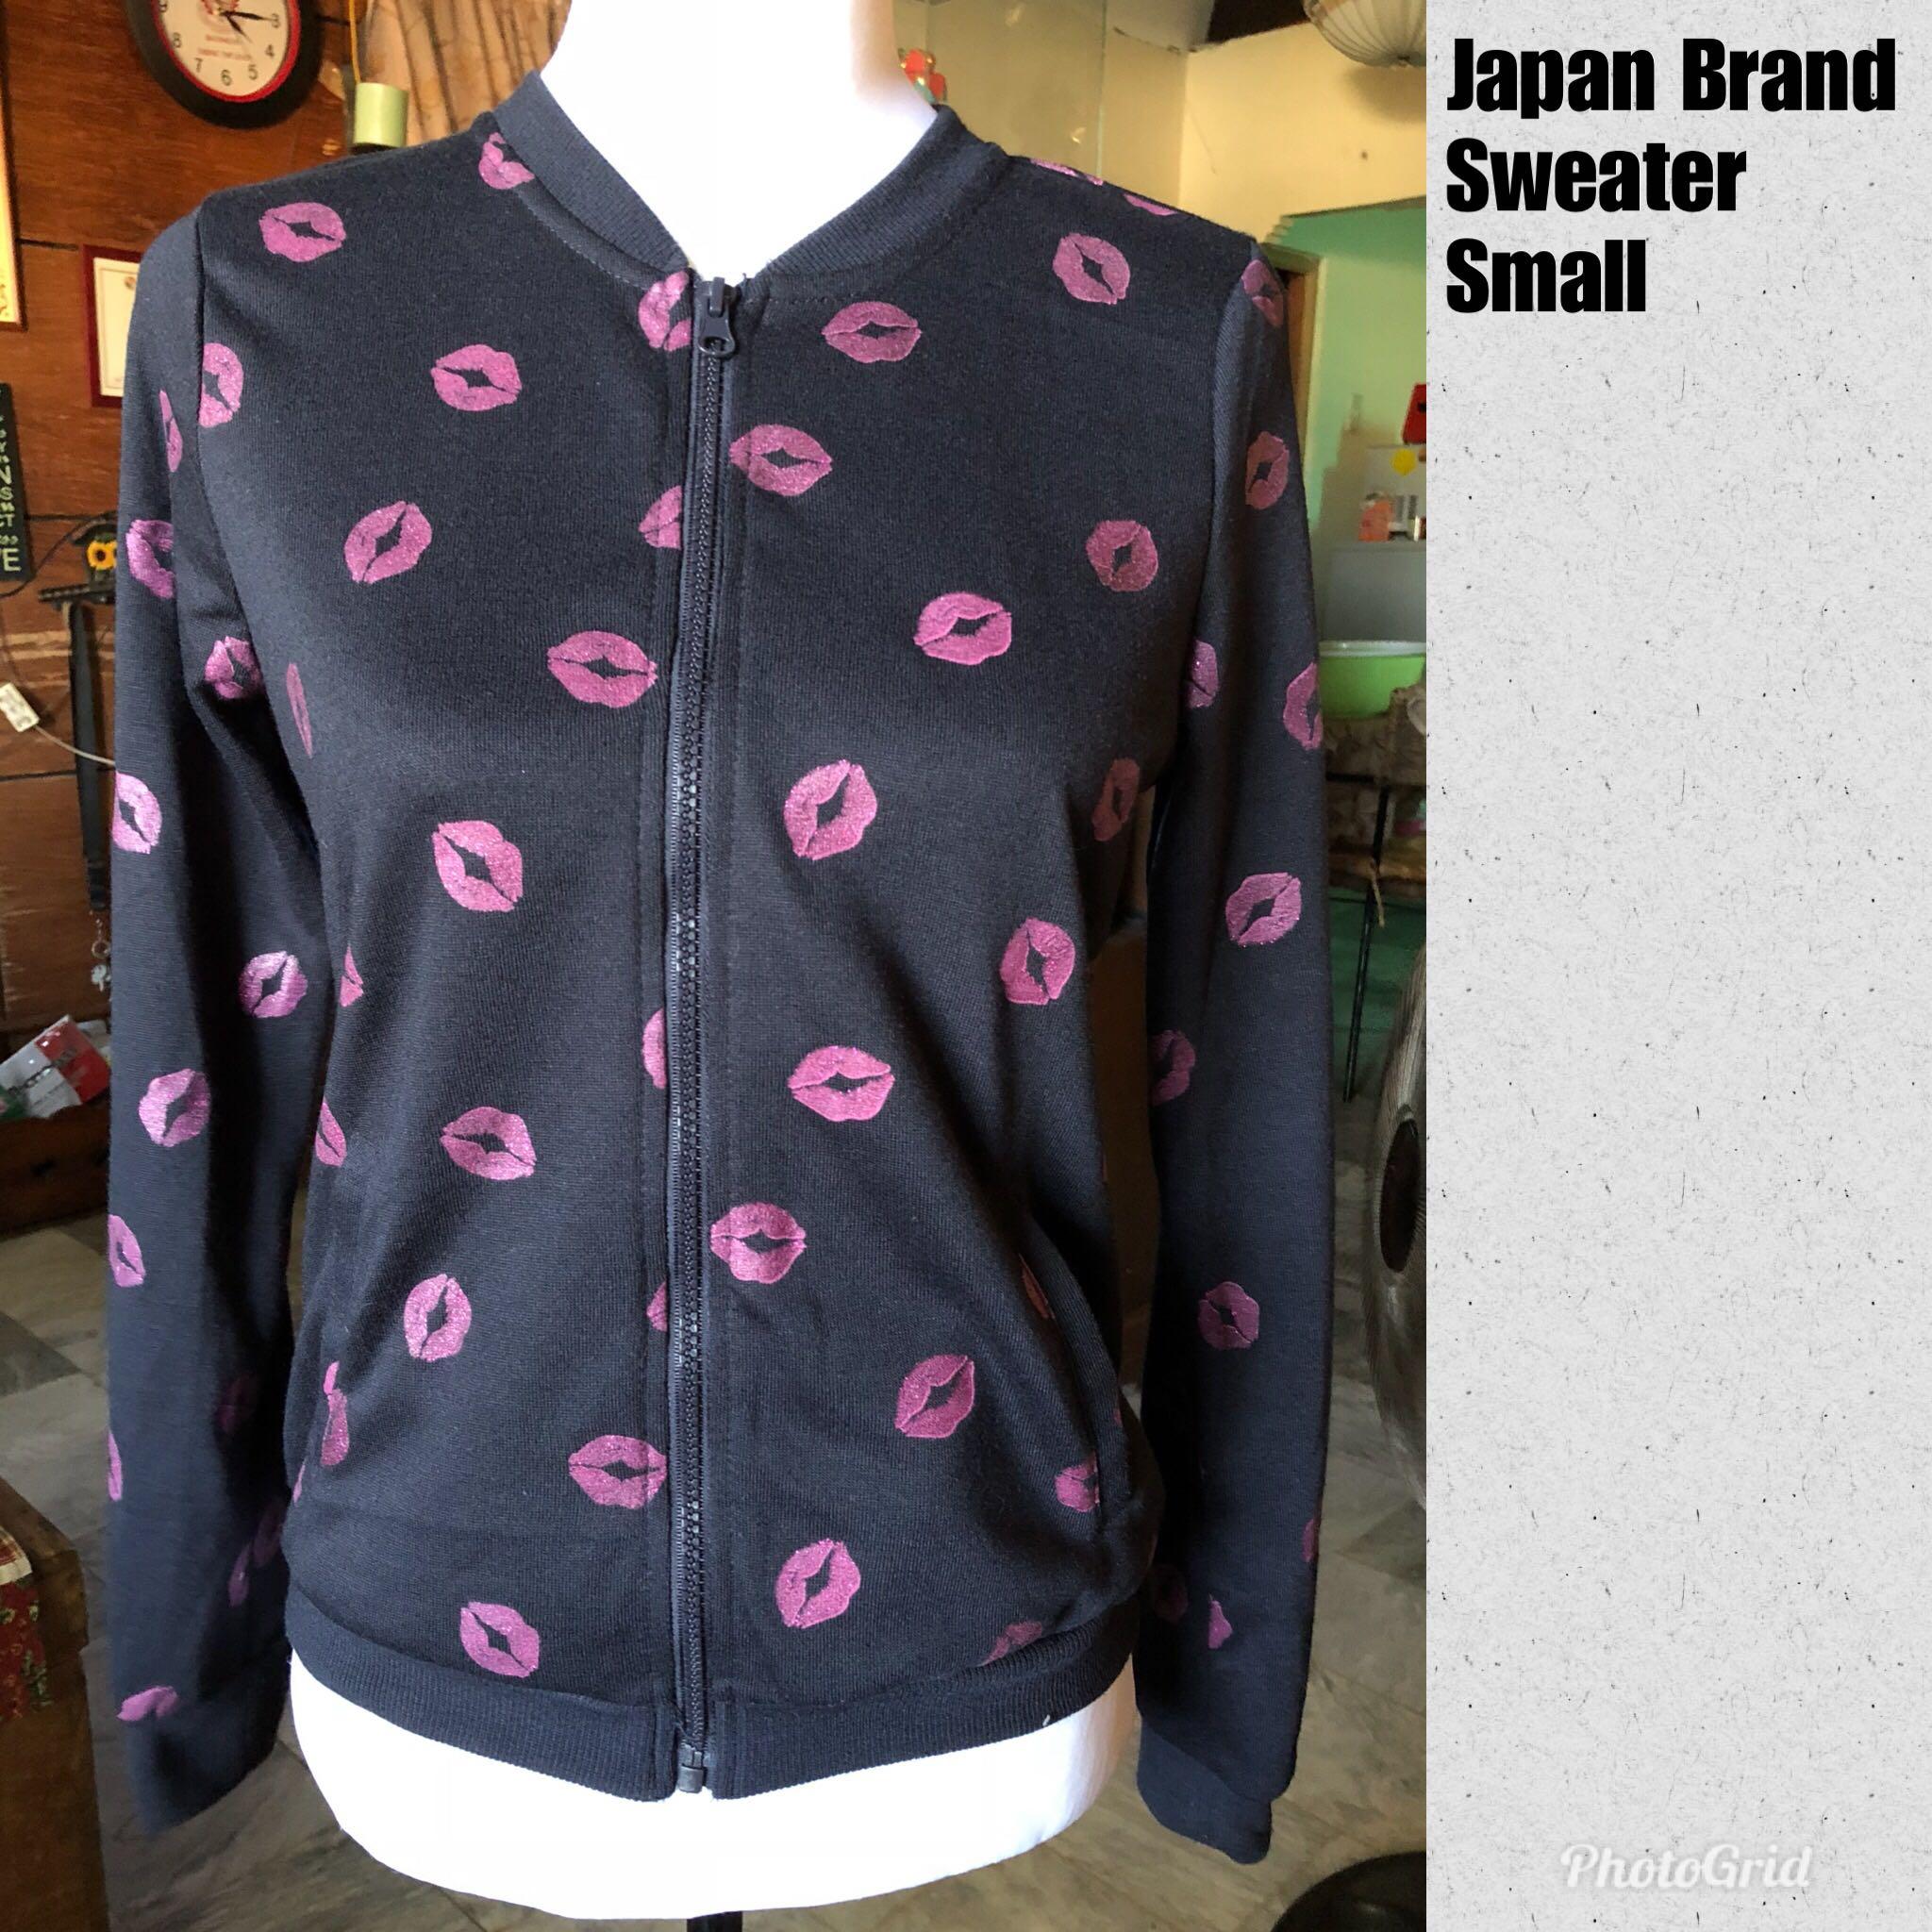 Japan brand sweater